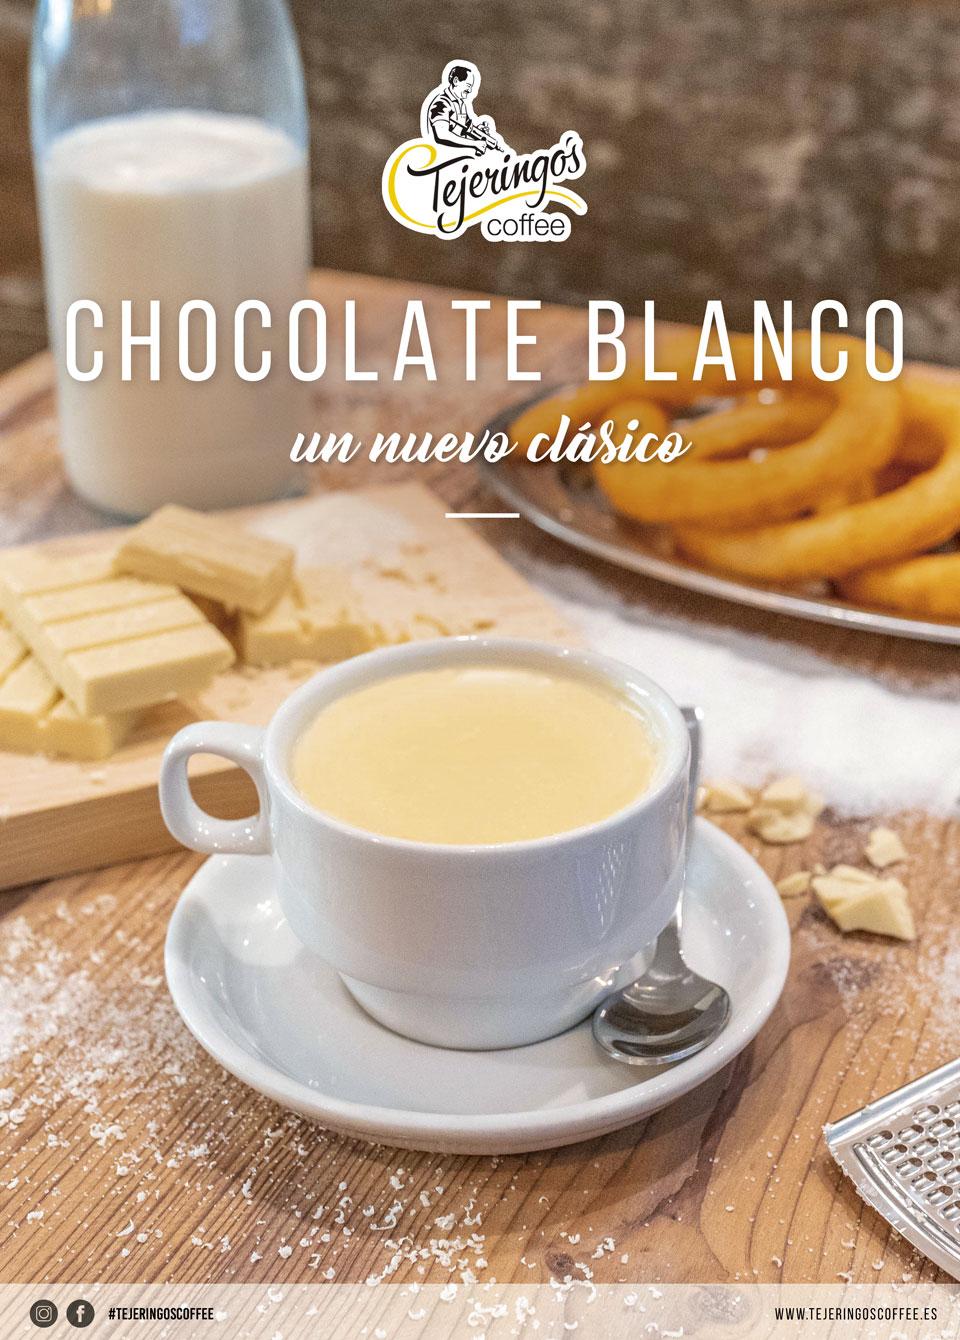 TC-50X70-CARTEL-CHOCOLATE-BLANCO